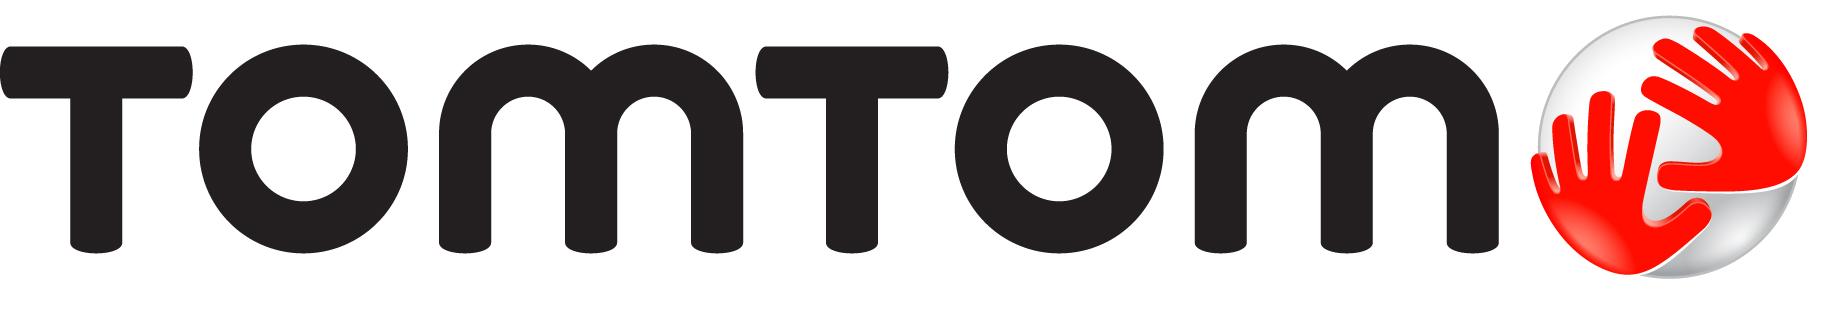 daytraden in TomTom koersverloop